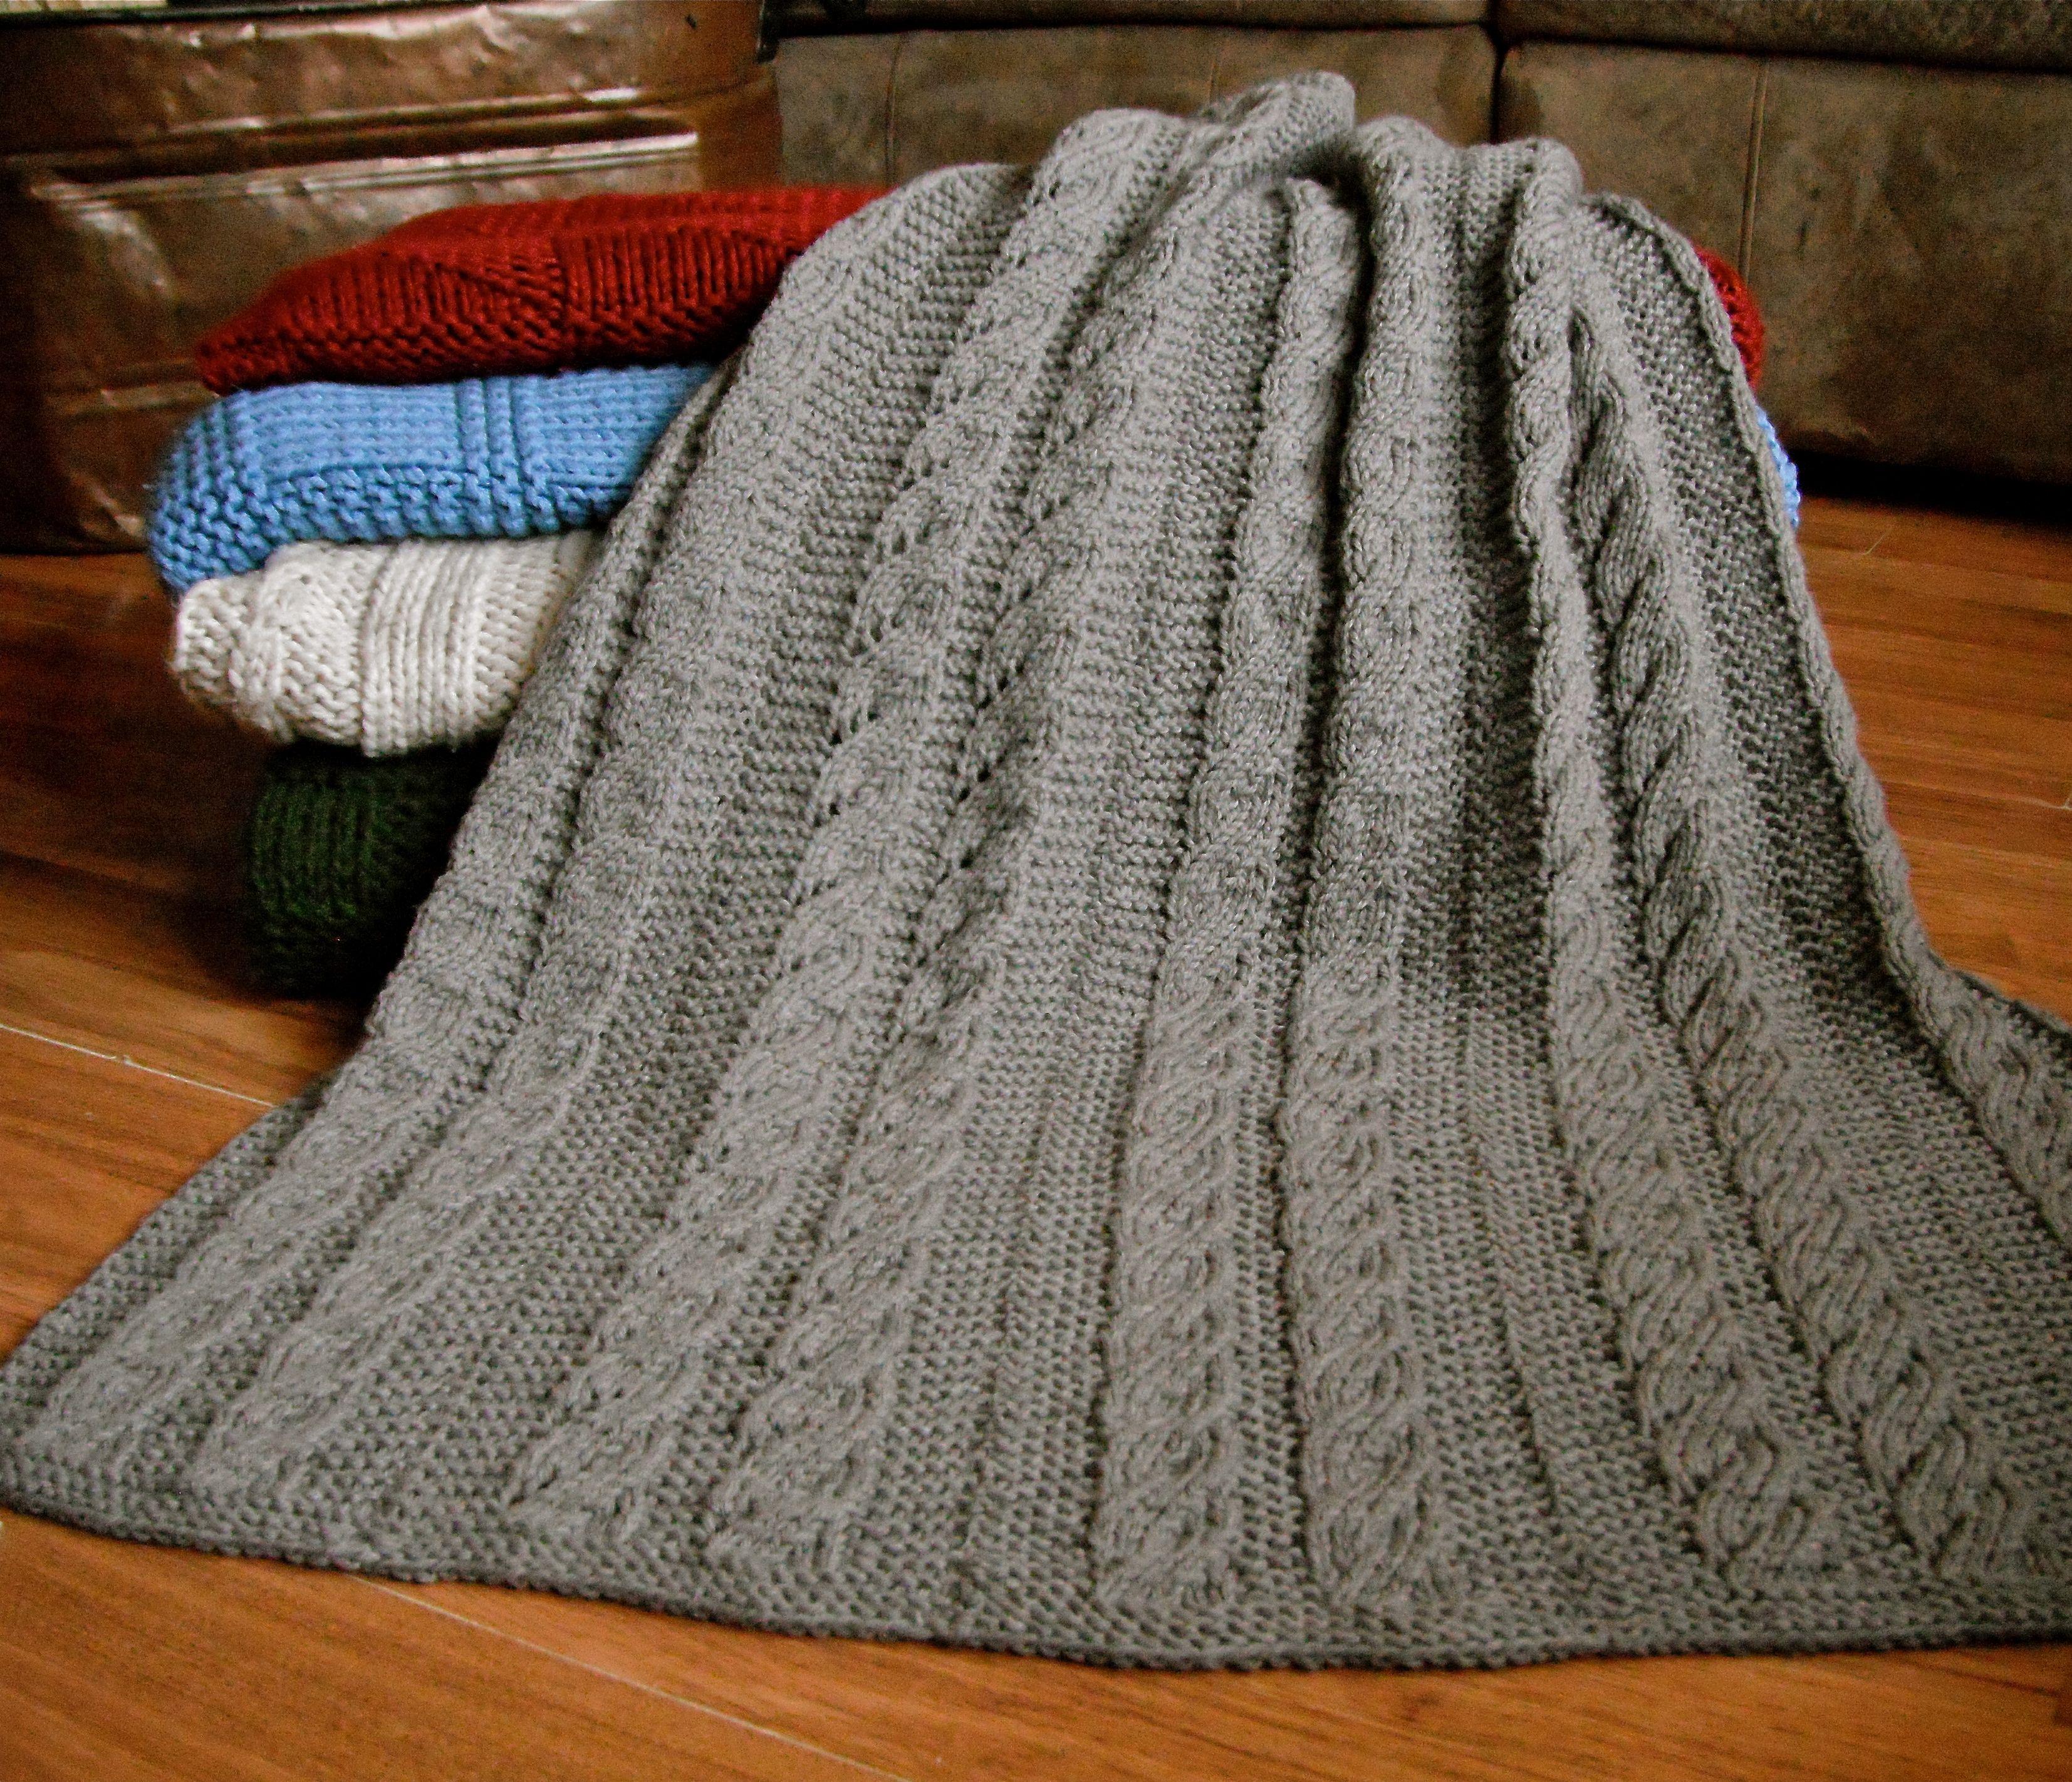 Knit Blanket Pattern Spiral Columns Ba Blanket Pattern Knitting Patterns And Crochet